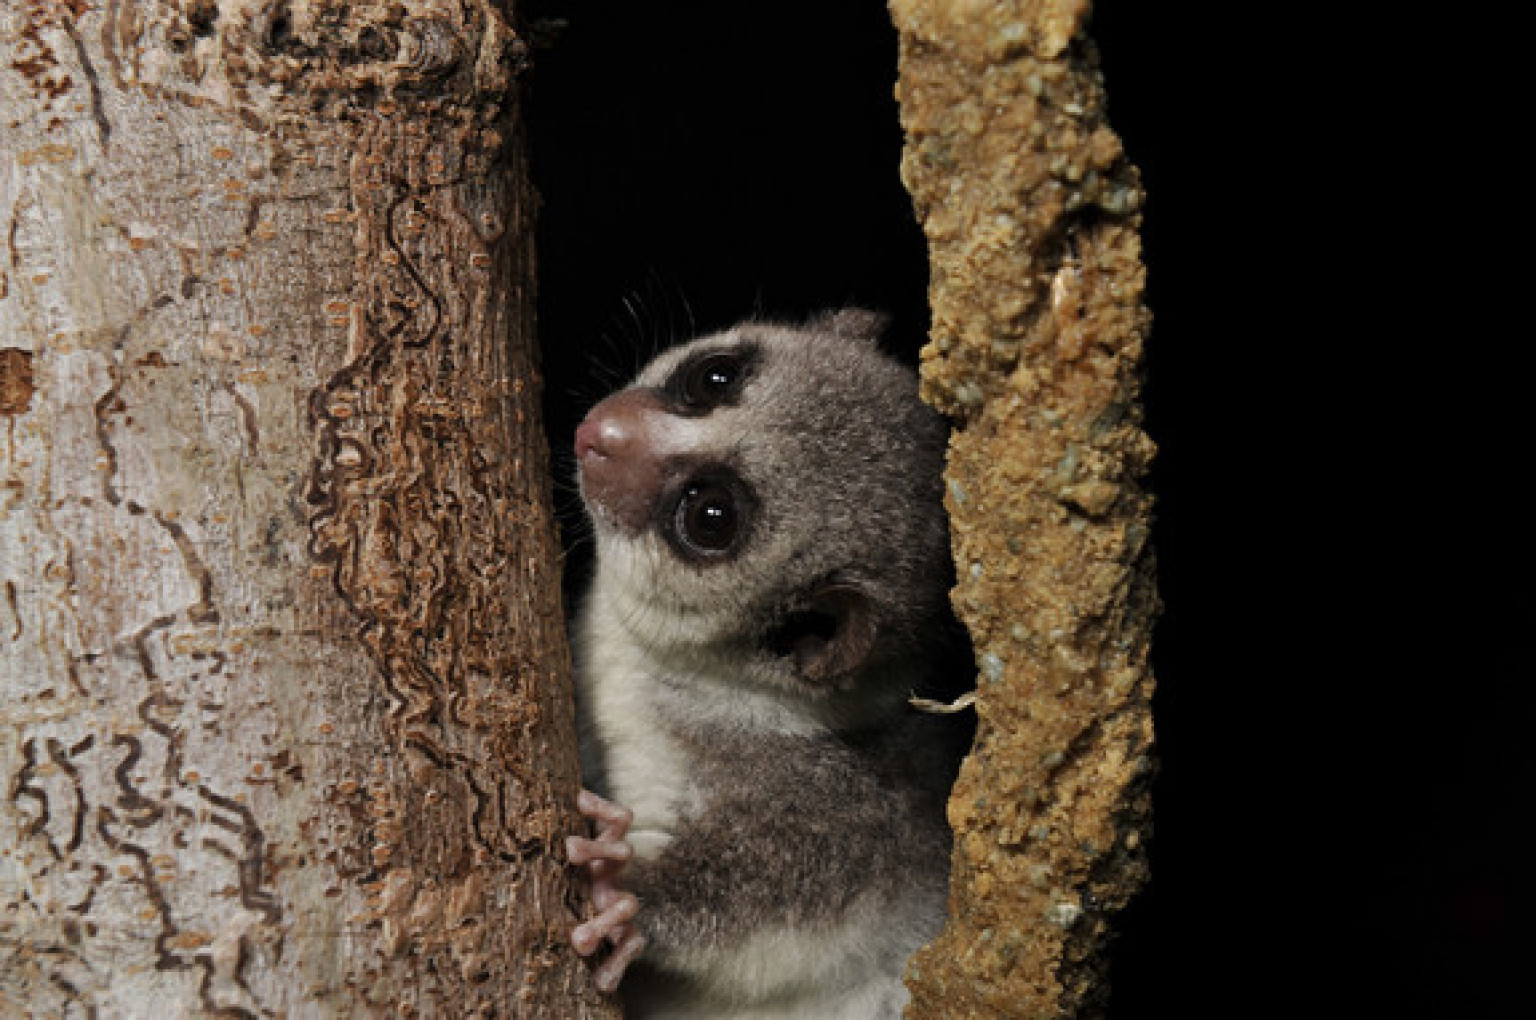 Odd Hibernating Primate Fat Tailed Dwarf Lemur May Help